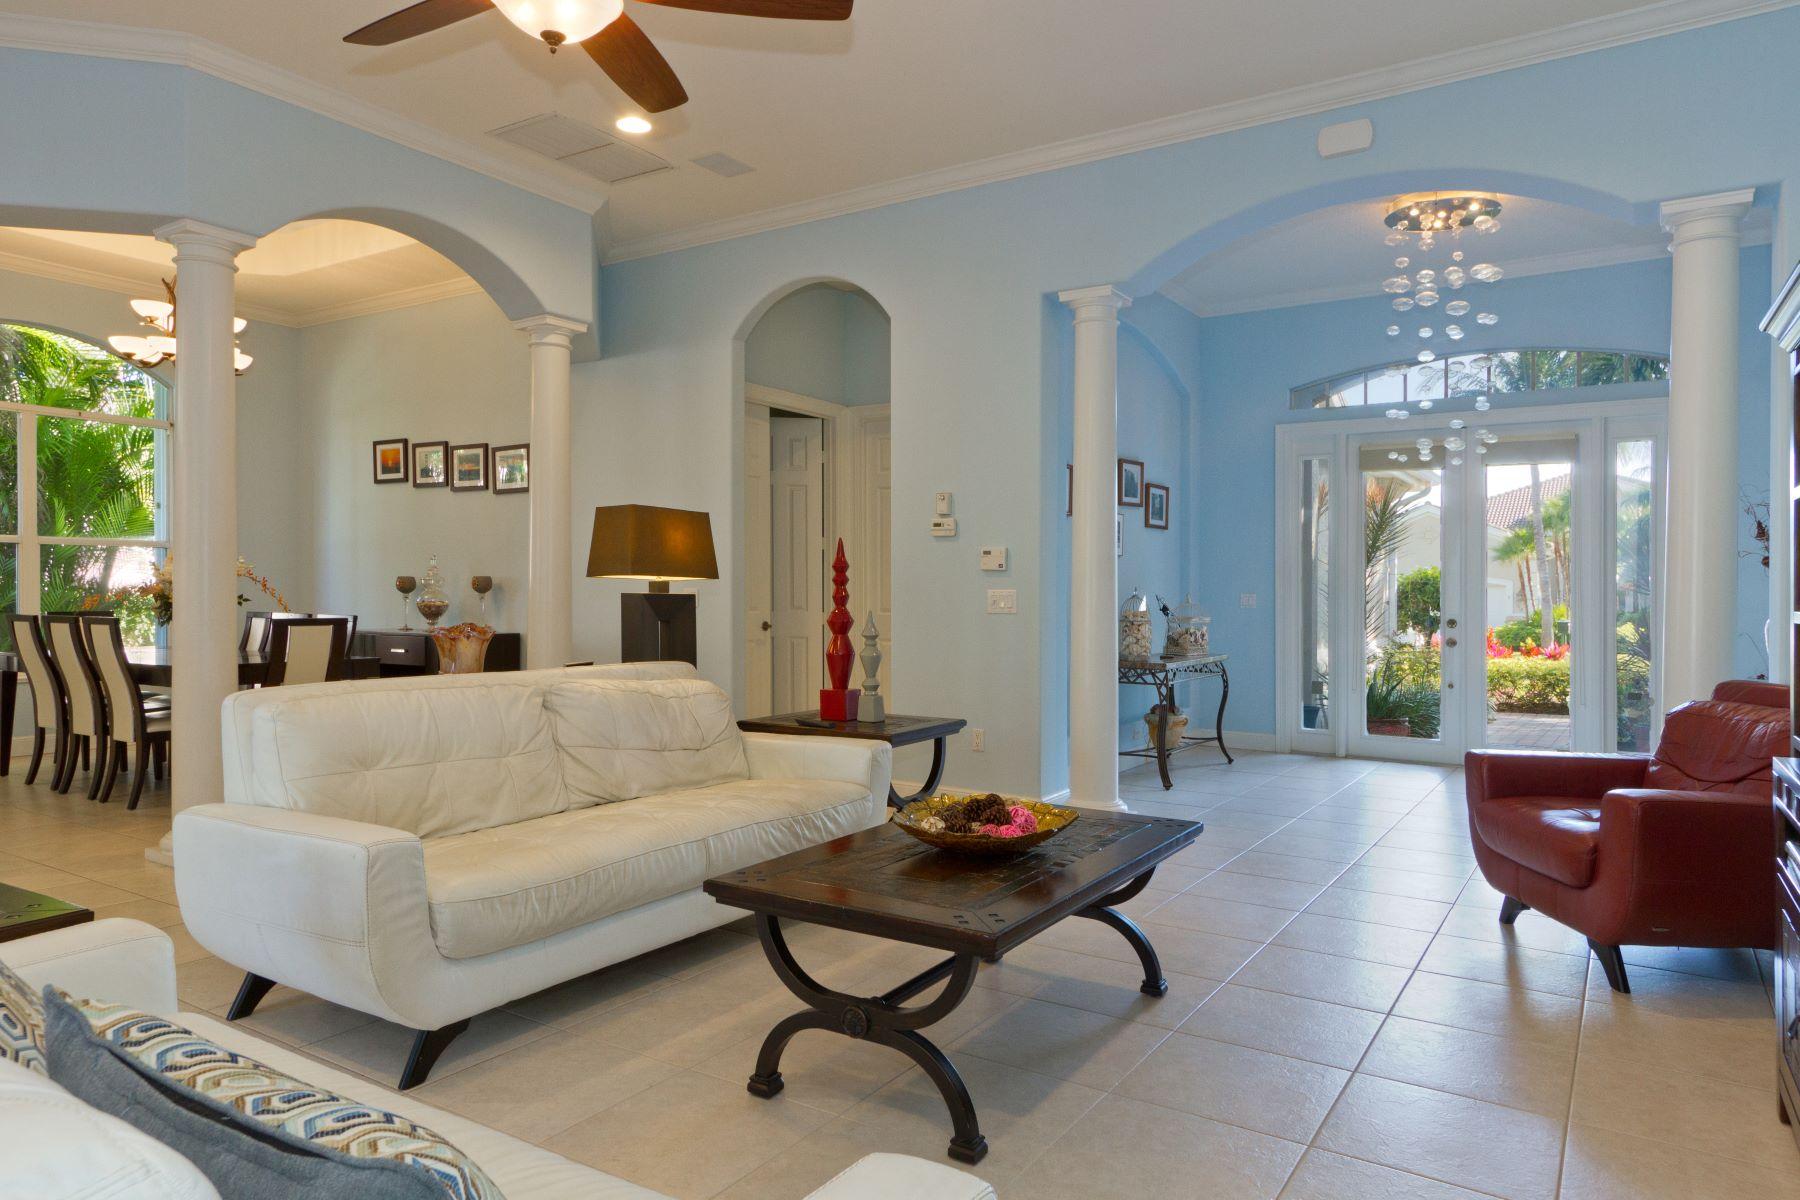 Single Family Homes for Sale at 1338 Riverside Lane Vero Beach, Florida 32963 United States